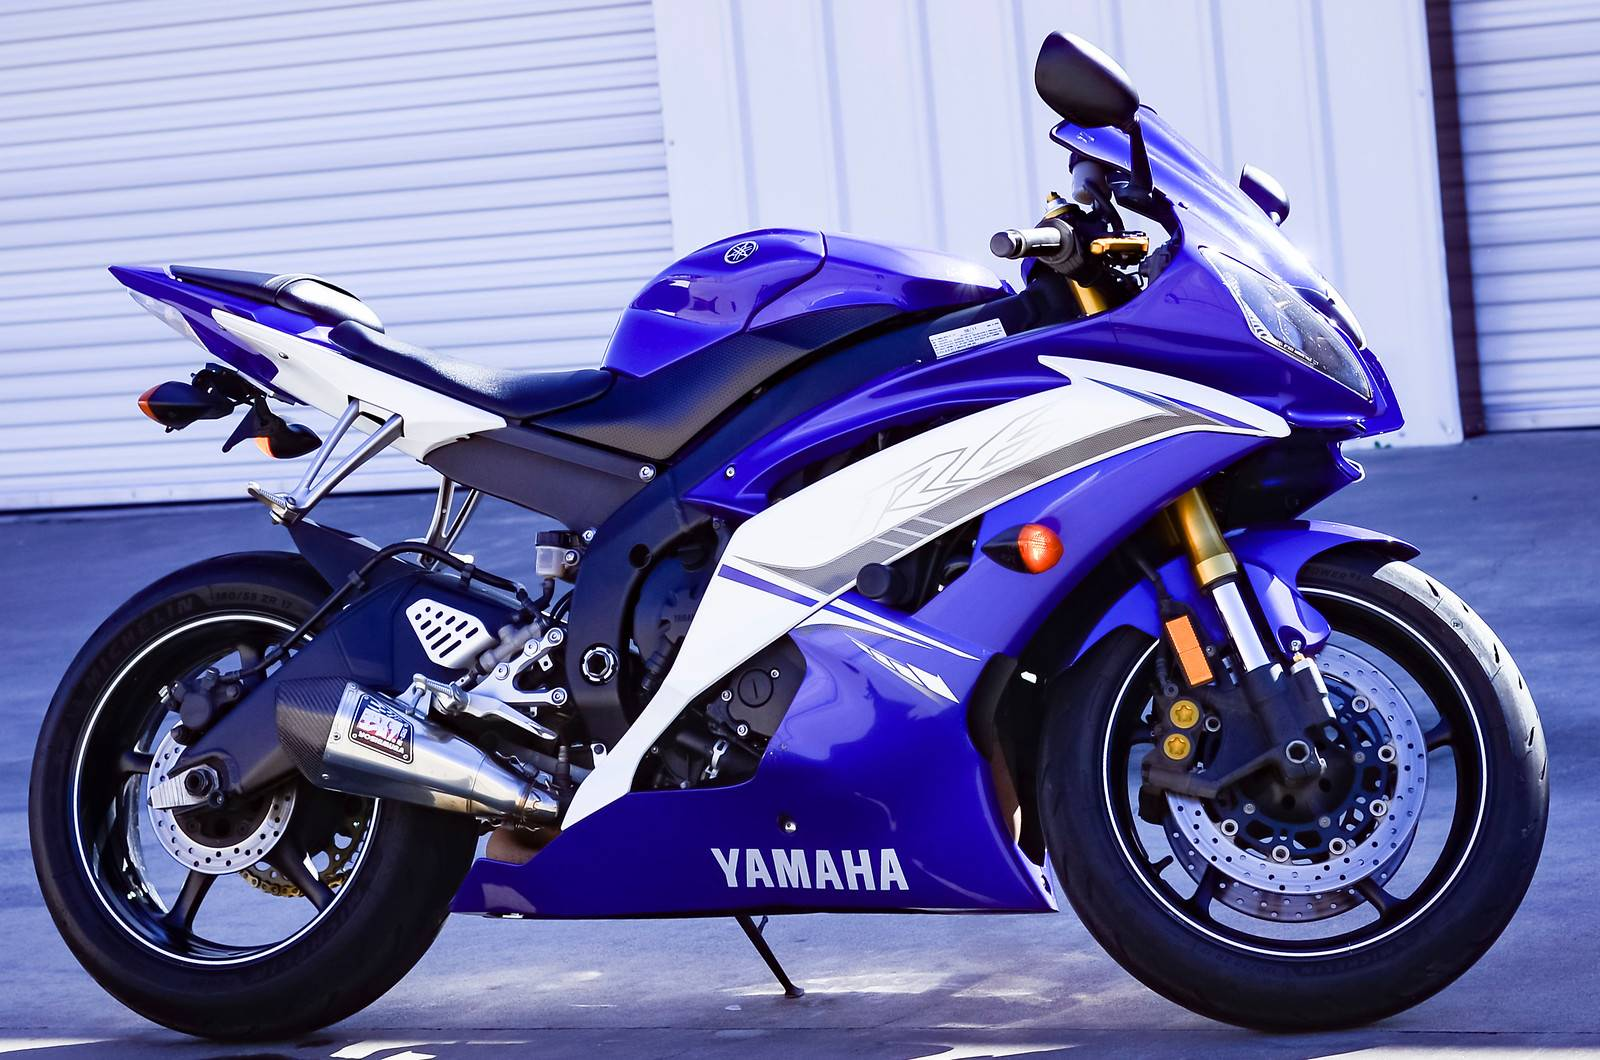 2011 Yamaha YZF-R6 1